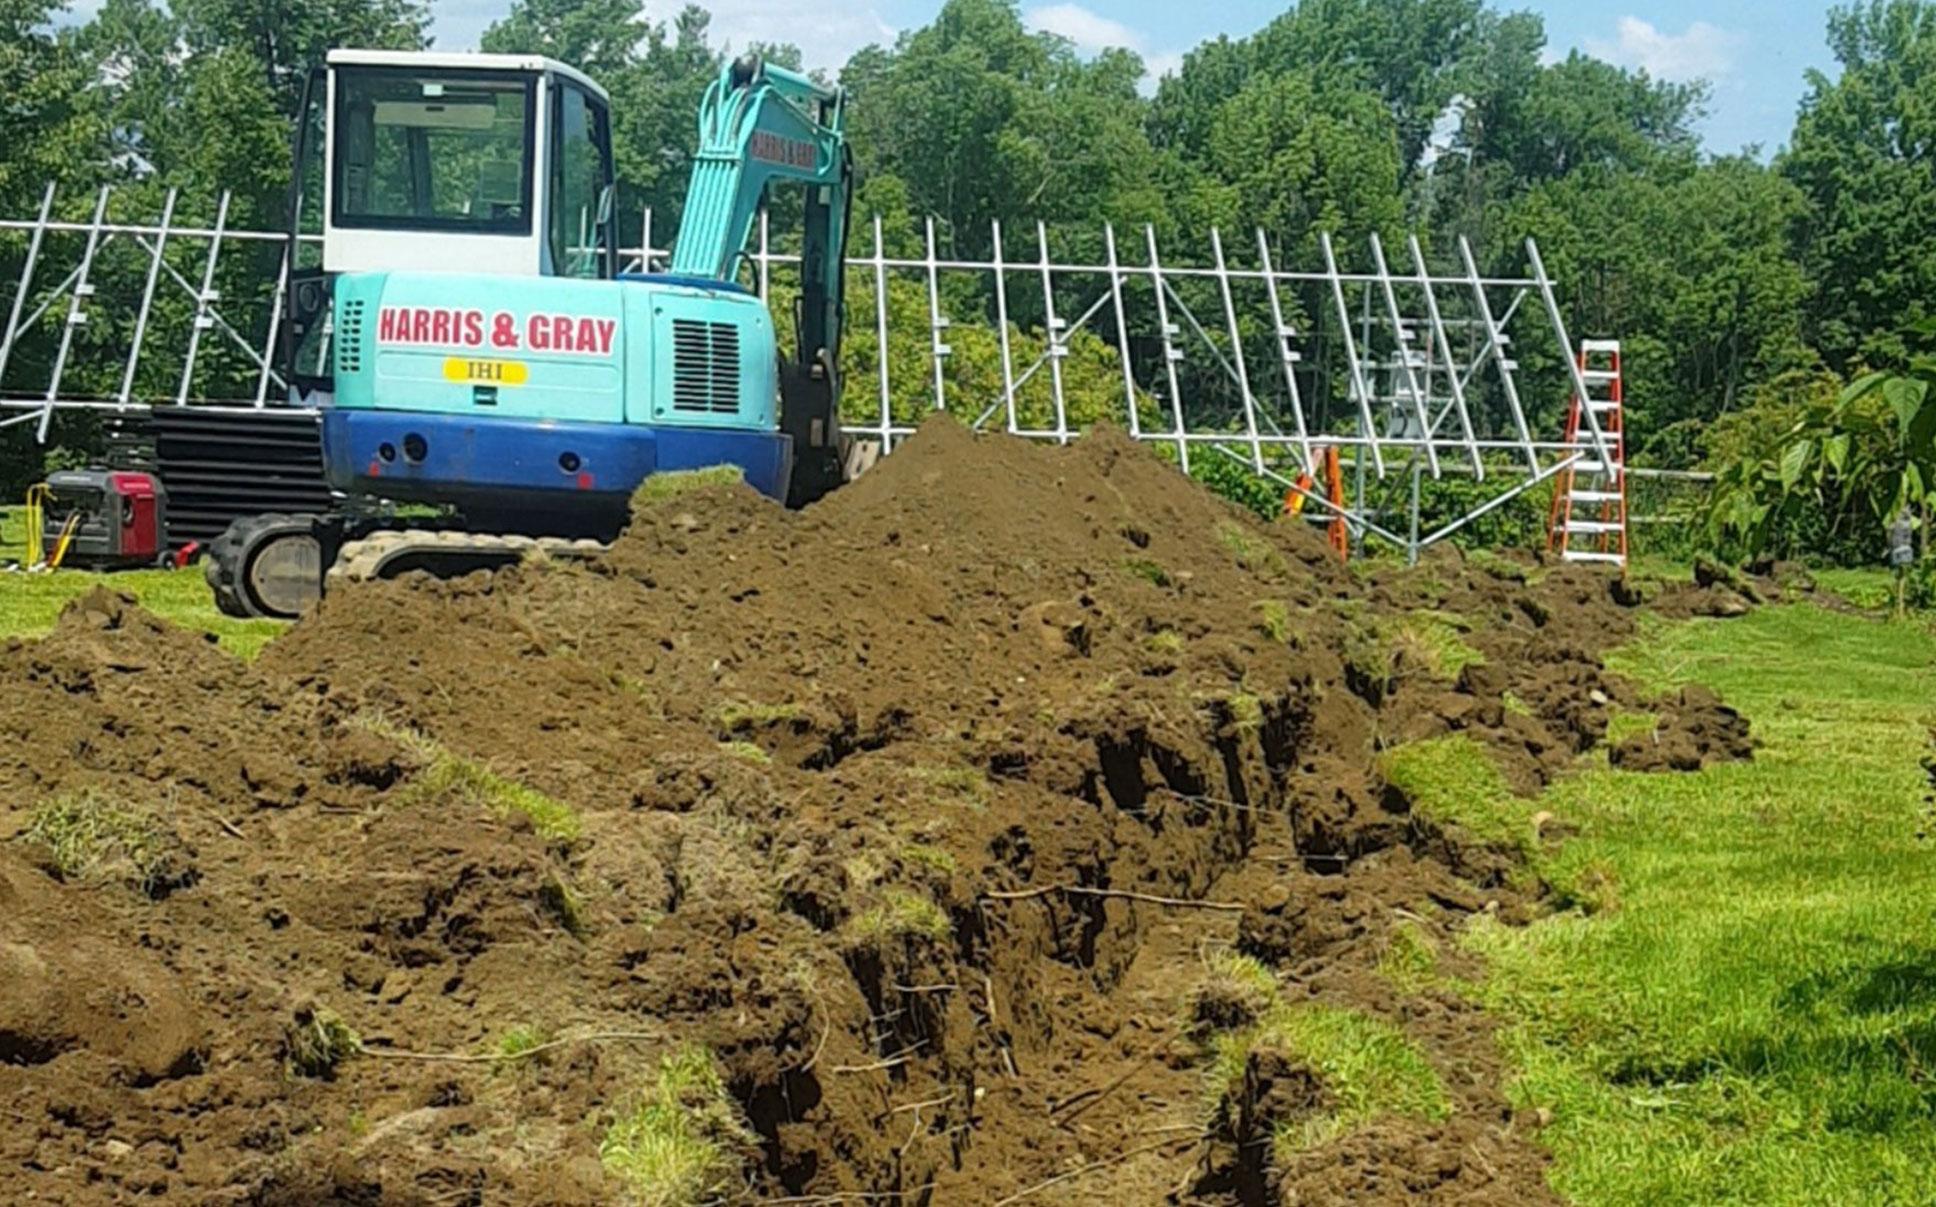 Harris & Gray Excavating & Concrete Contractors